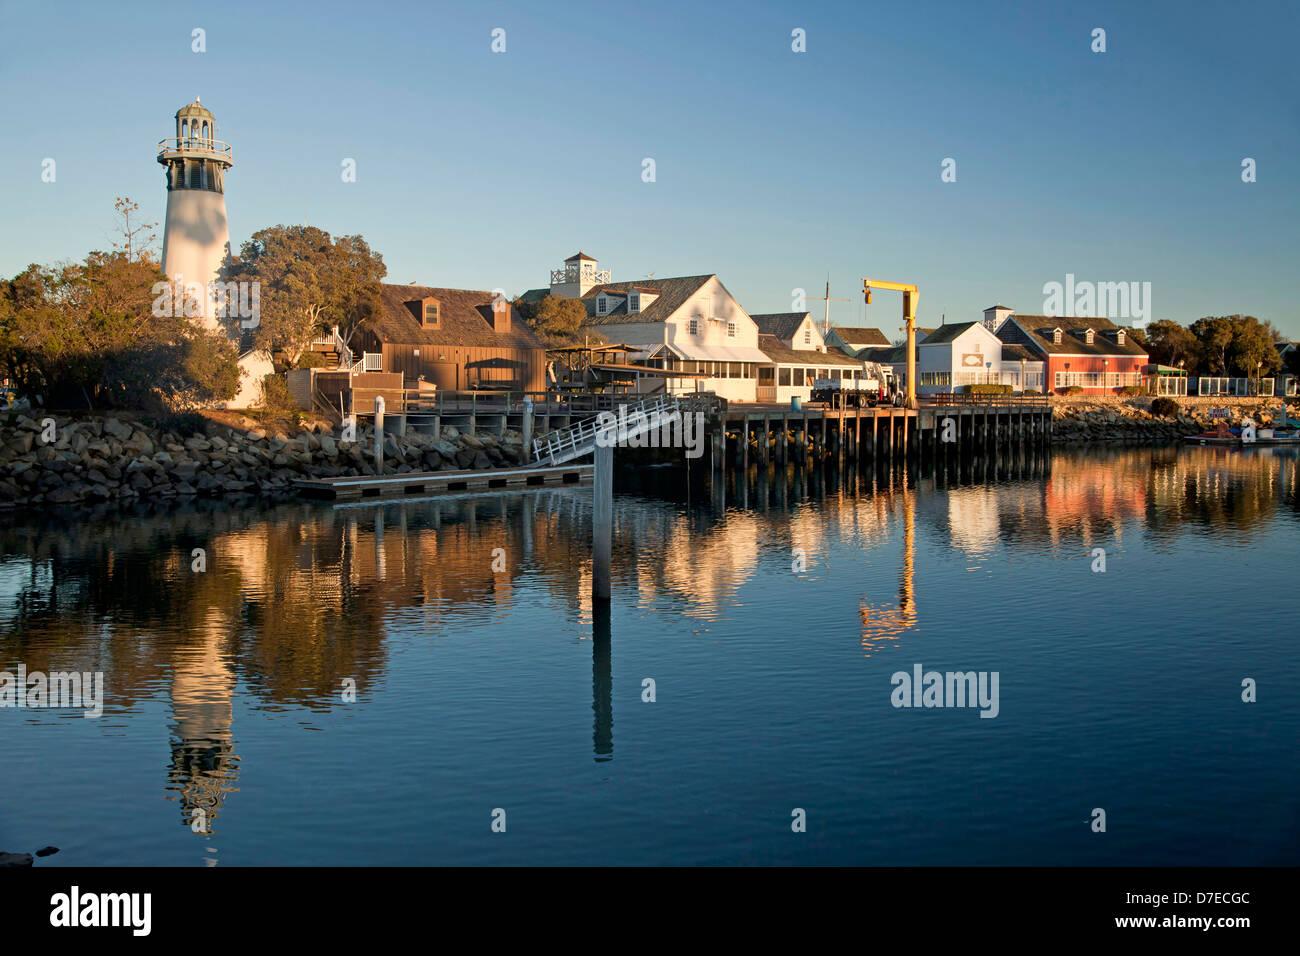 Oxnard Stockfotos & Oxnard Bilder - Alamy